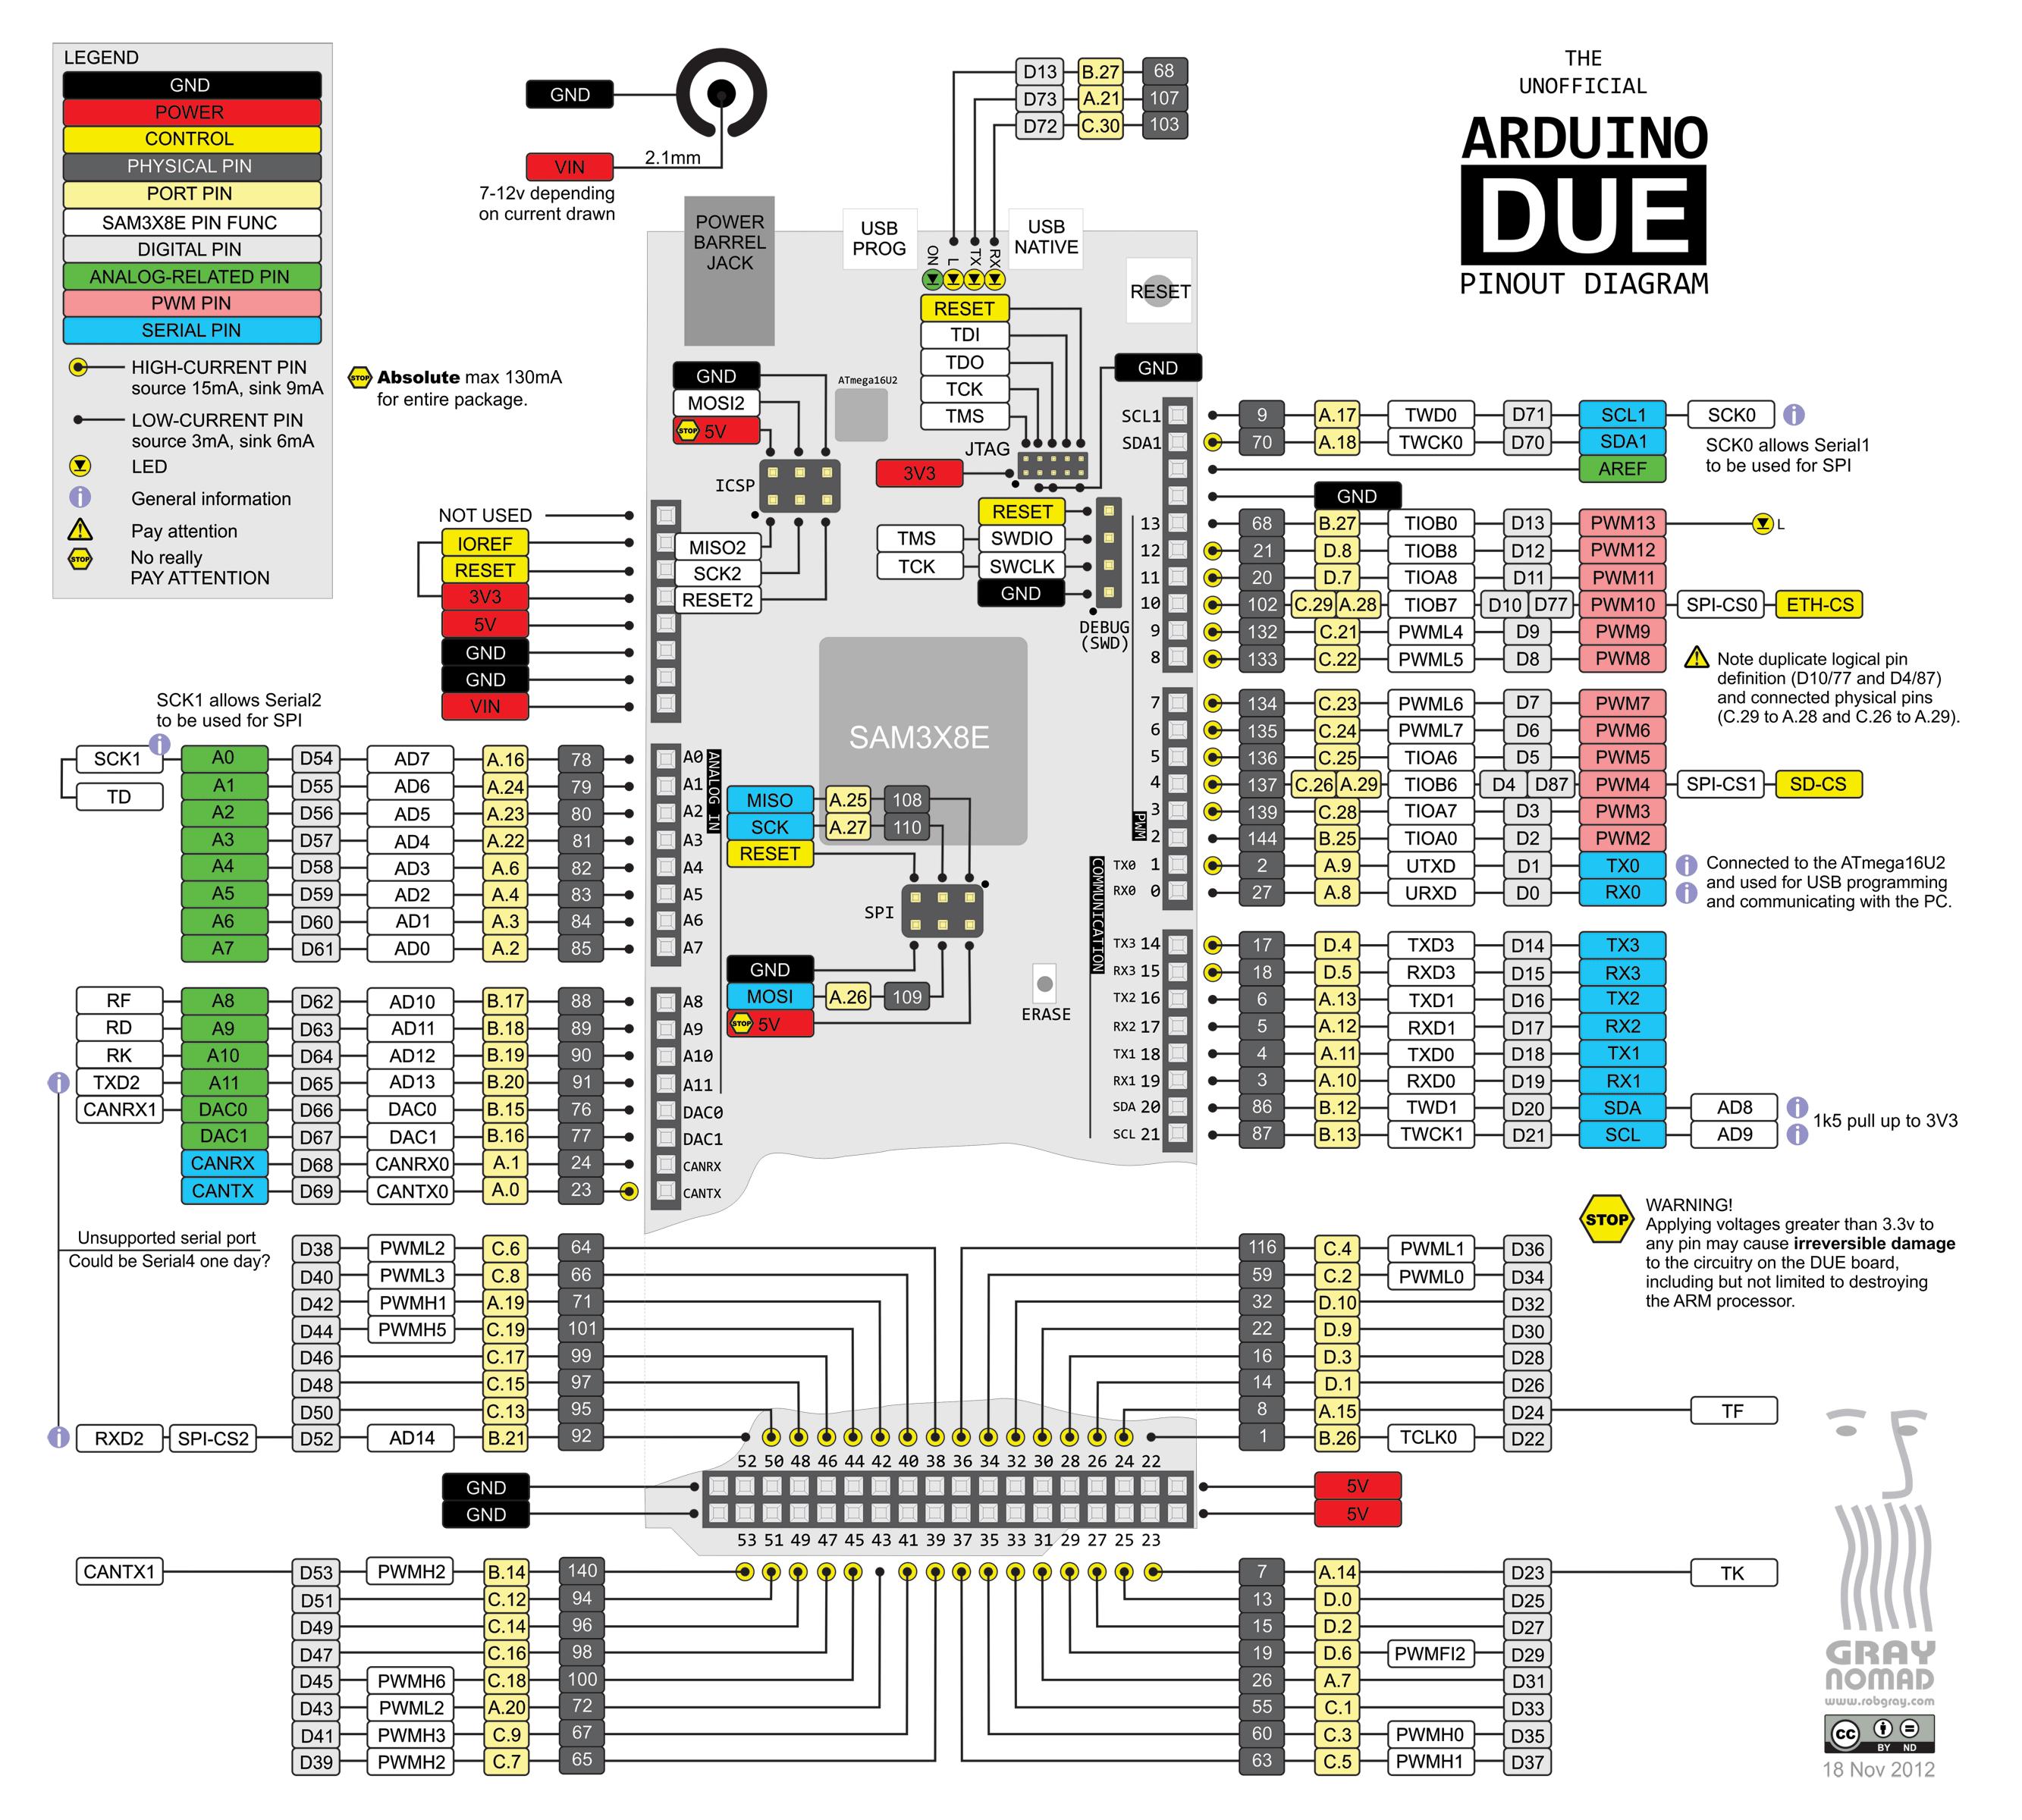 e6cb6cedb5849c6287defeab949c2841 arduino nano pinout diagram arduino pinterest arduino grbl 1.1 wiring diagram at panicattacktreatment.co